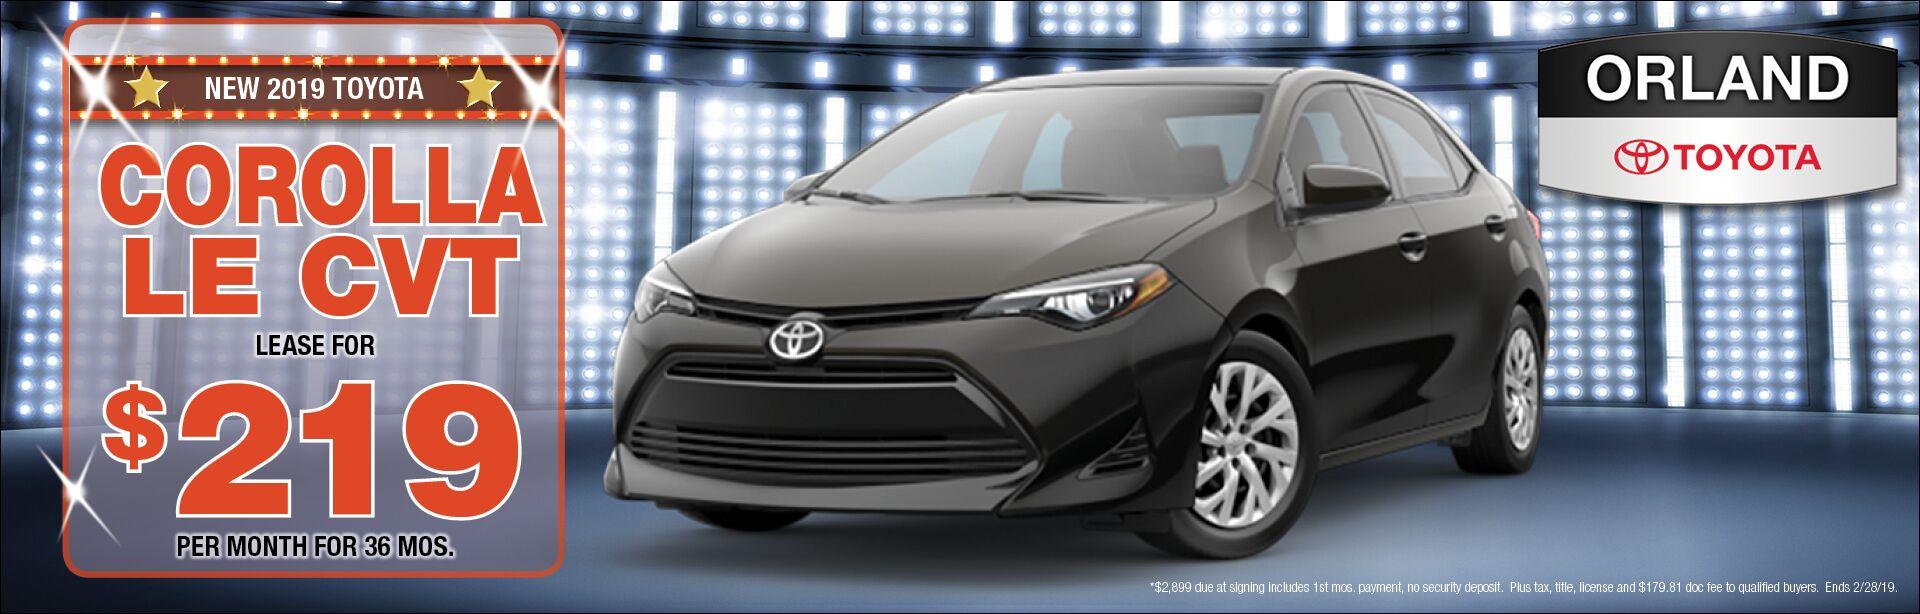 Toyota Dealer Chicago >> Orland Toyota Toyota Dealership Near Chicago Tinley Park Il